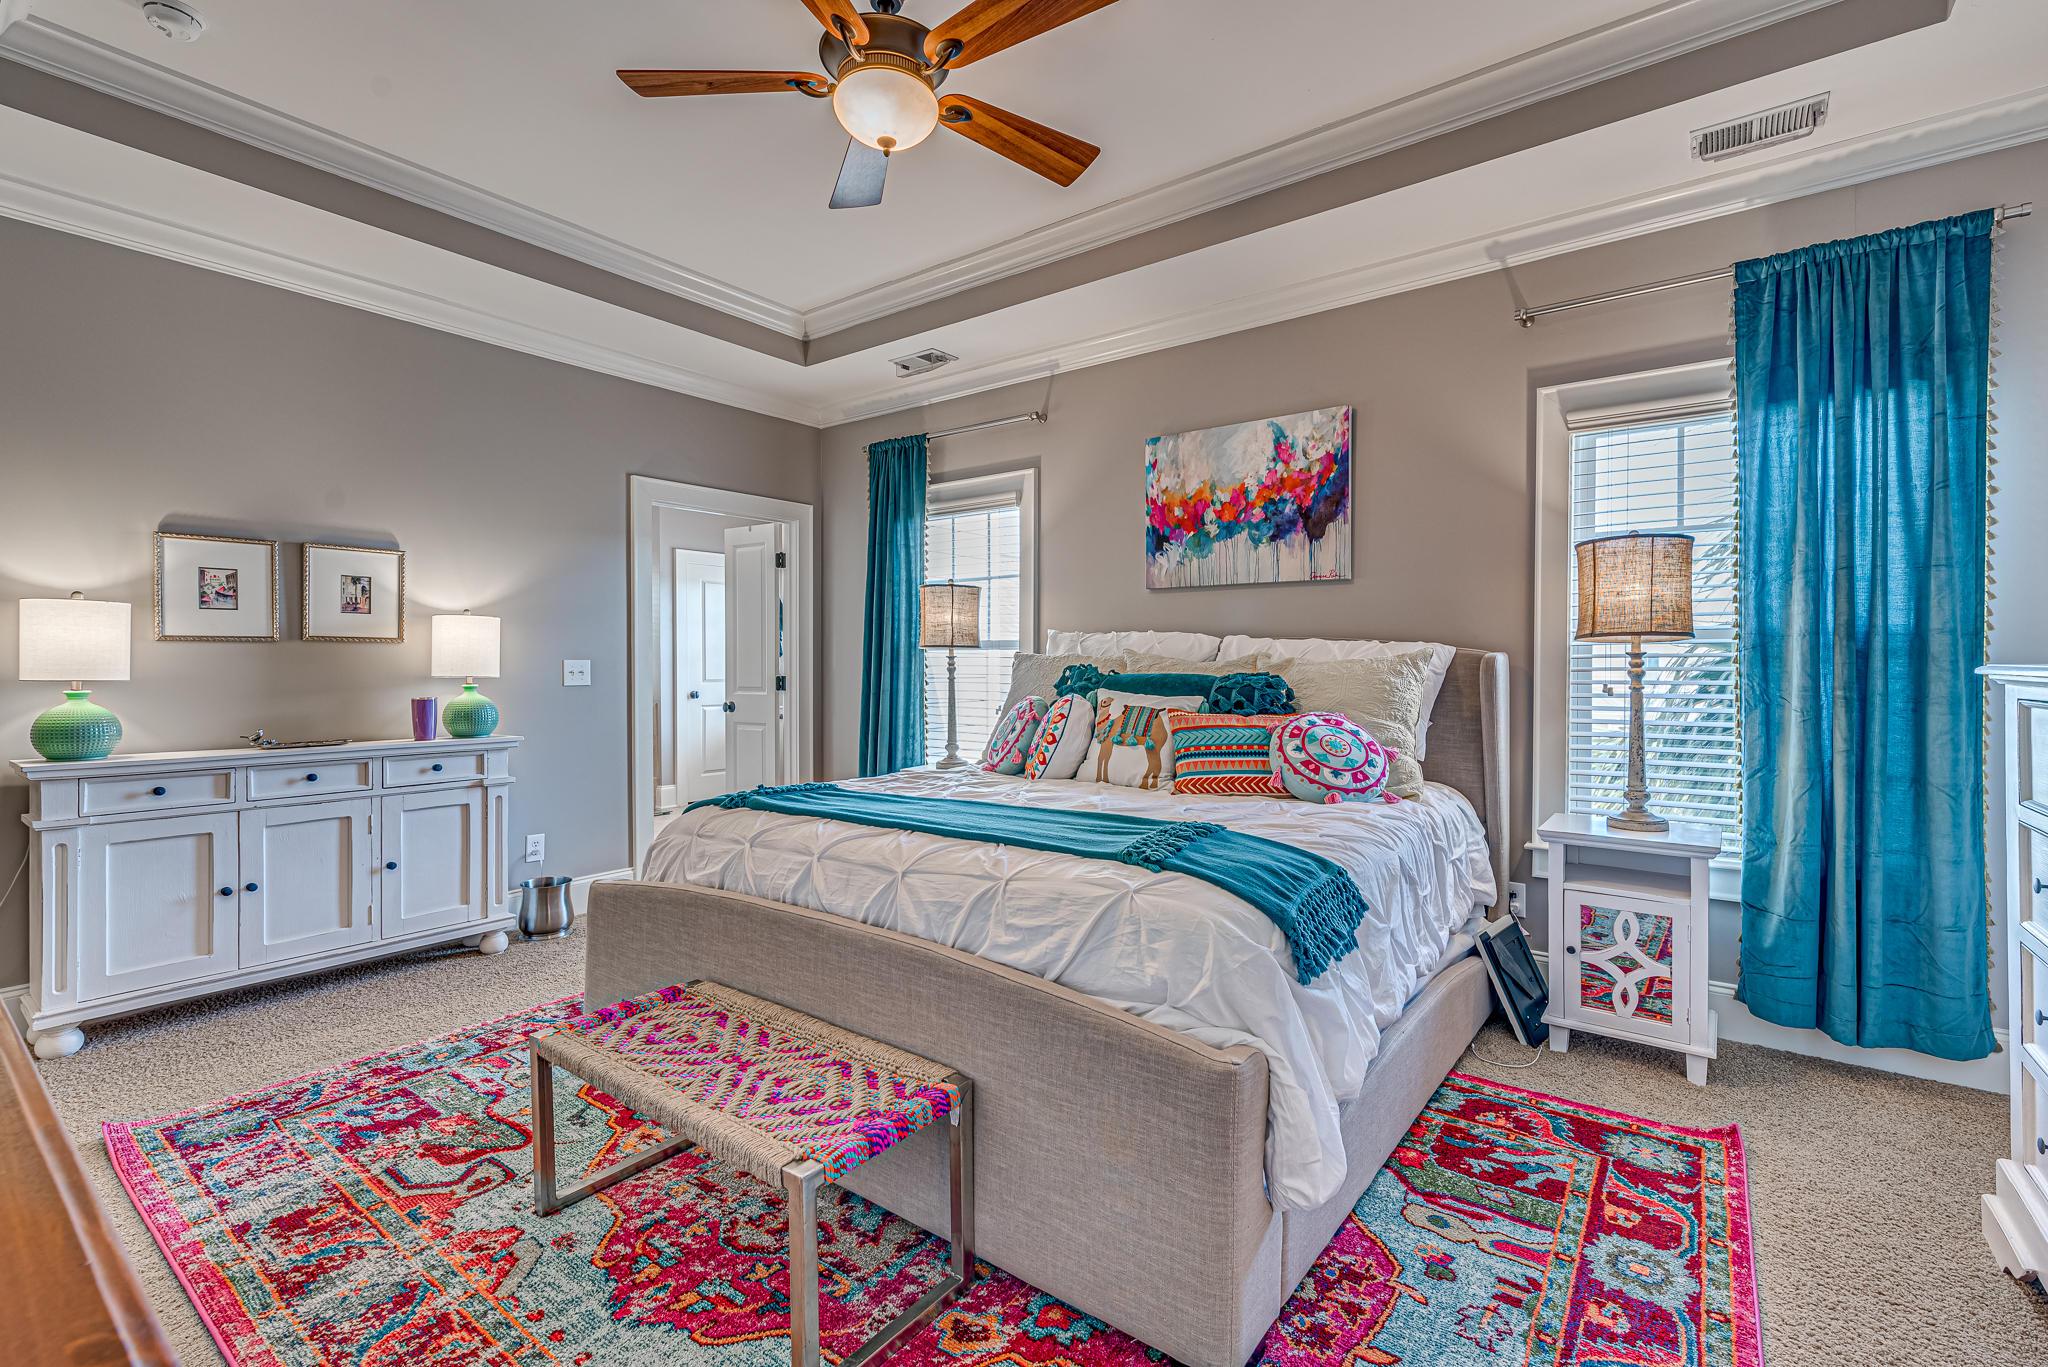 Daniel Island Smythe Park Homes For Sale - 1410 Wando View, Charleston, SC - 3